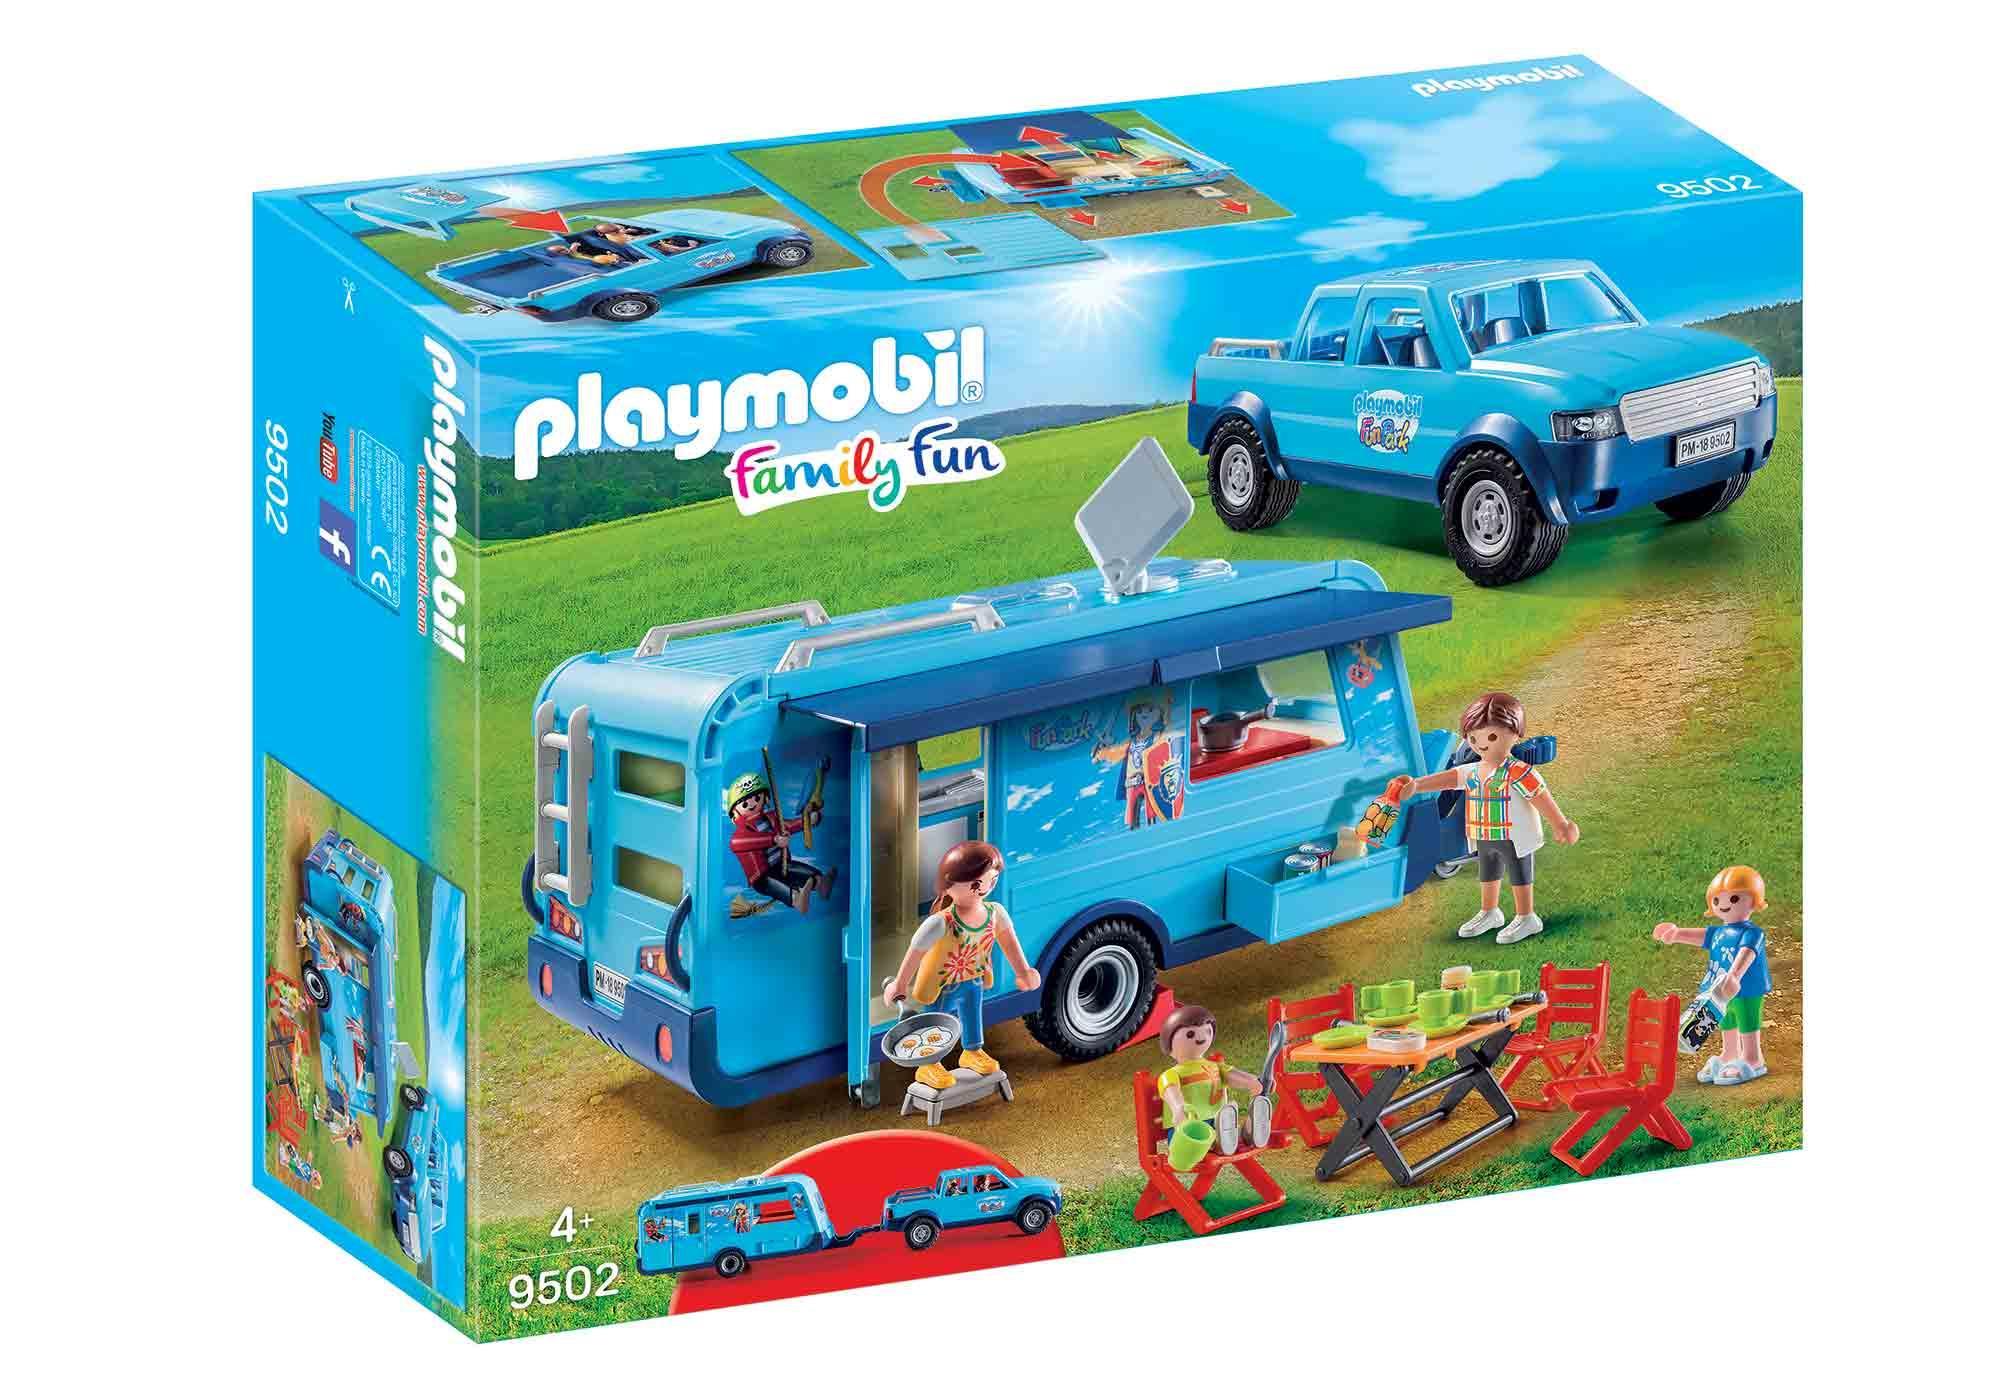 http://media.playmobil.com/i/playmobil/9502_product_box_front/PLAYMOBIL-FunPark Pick-Up mit Wohnwagen